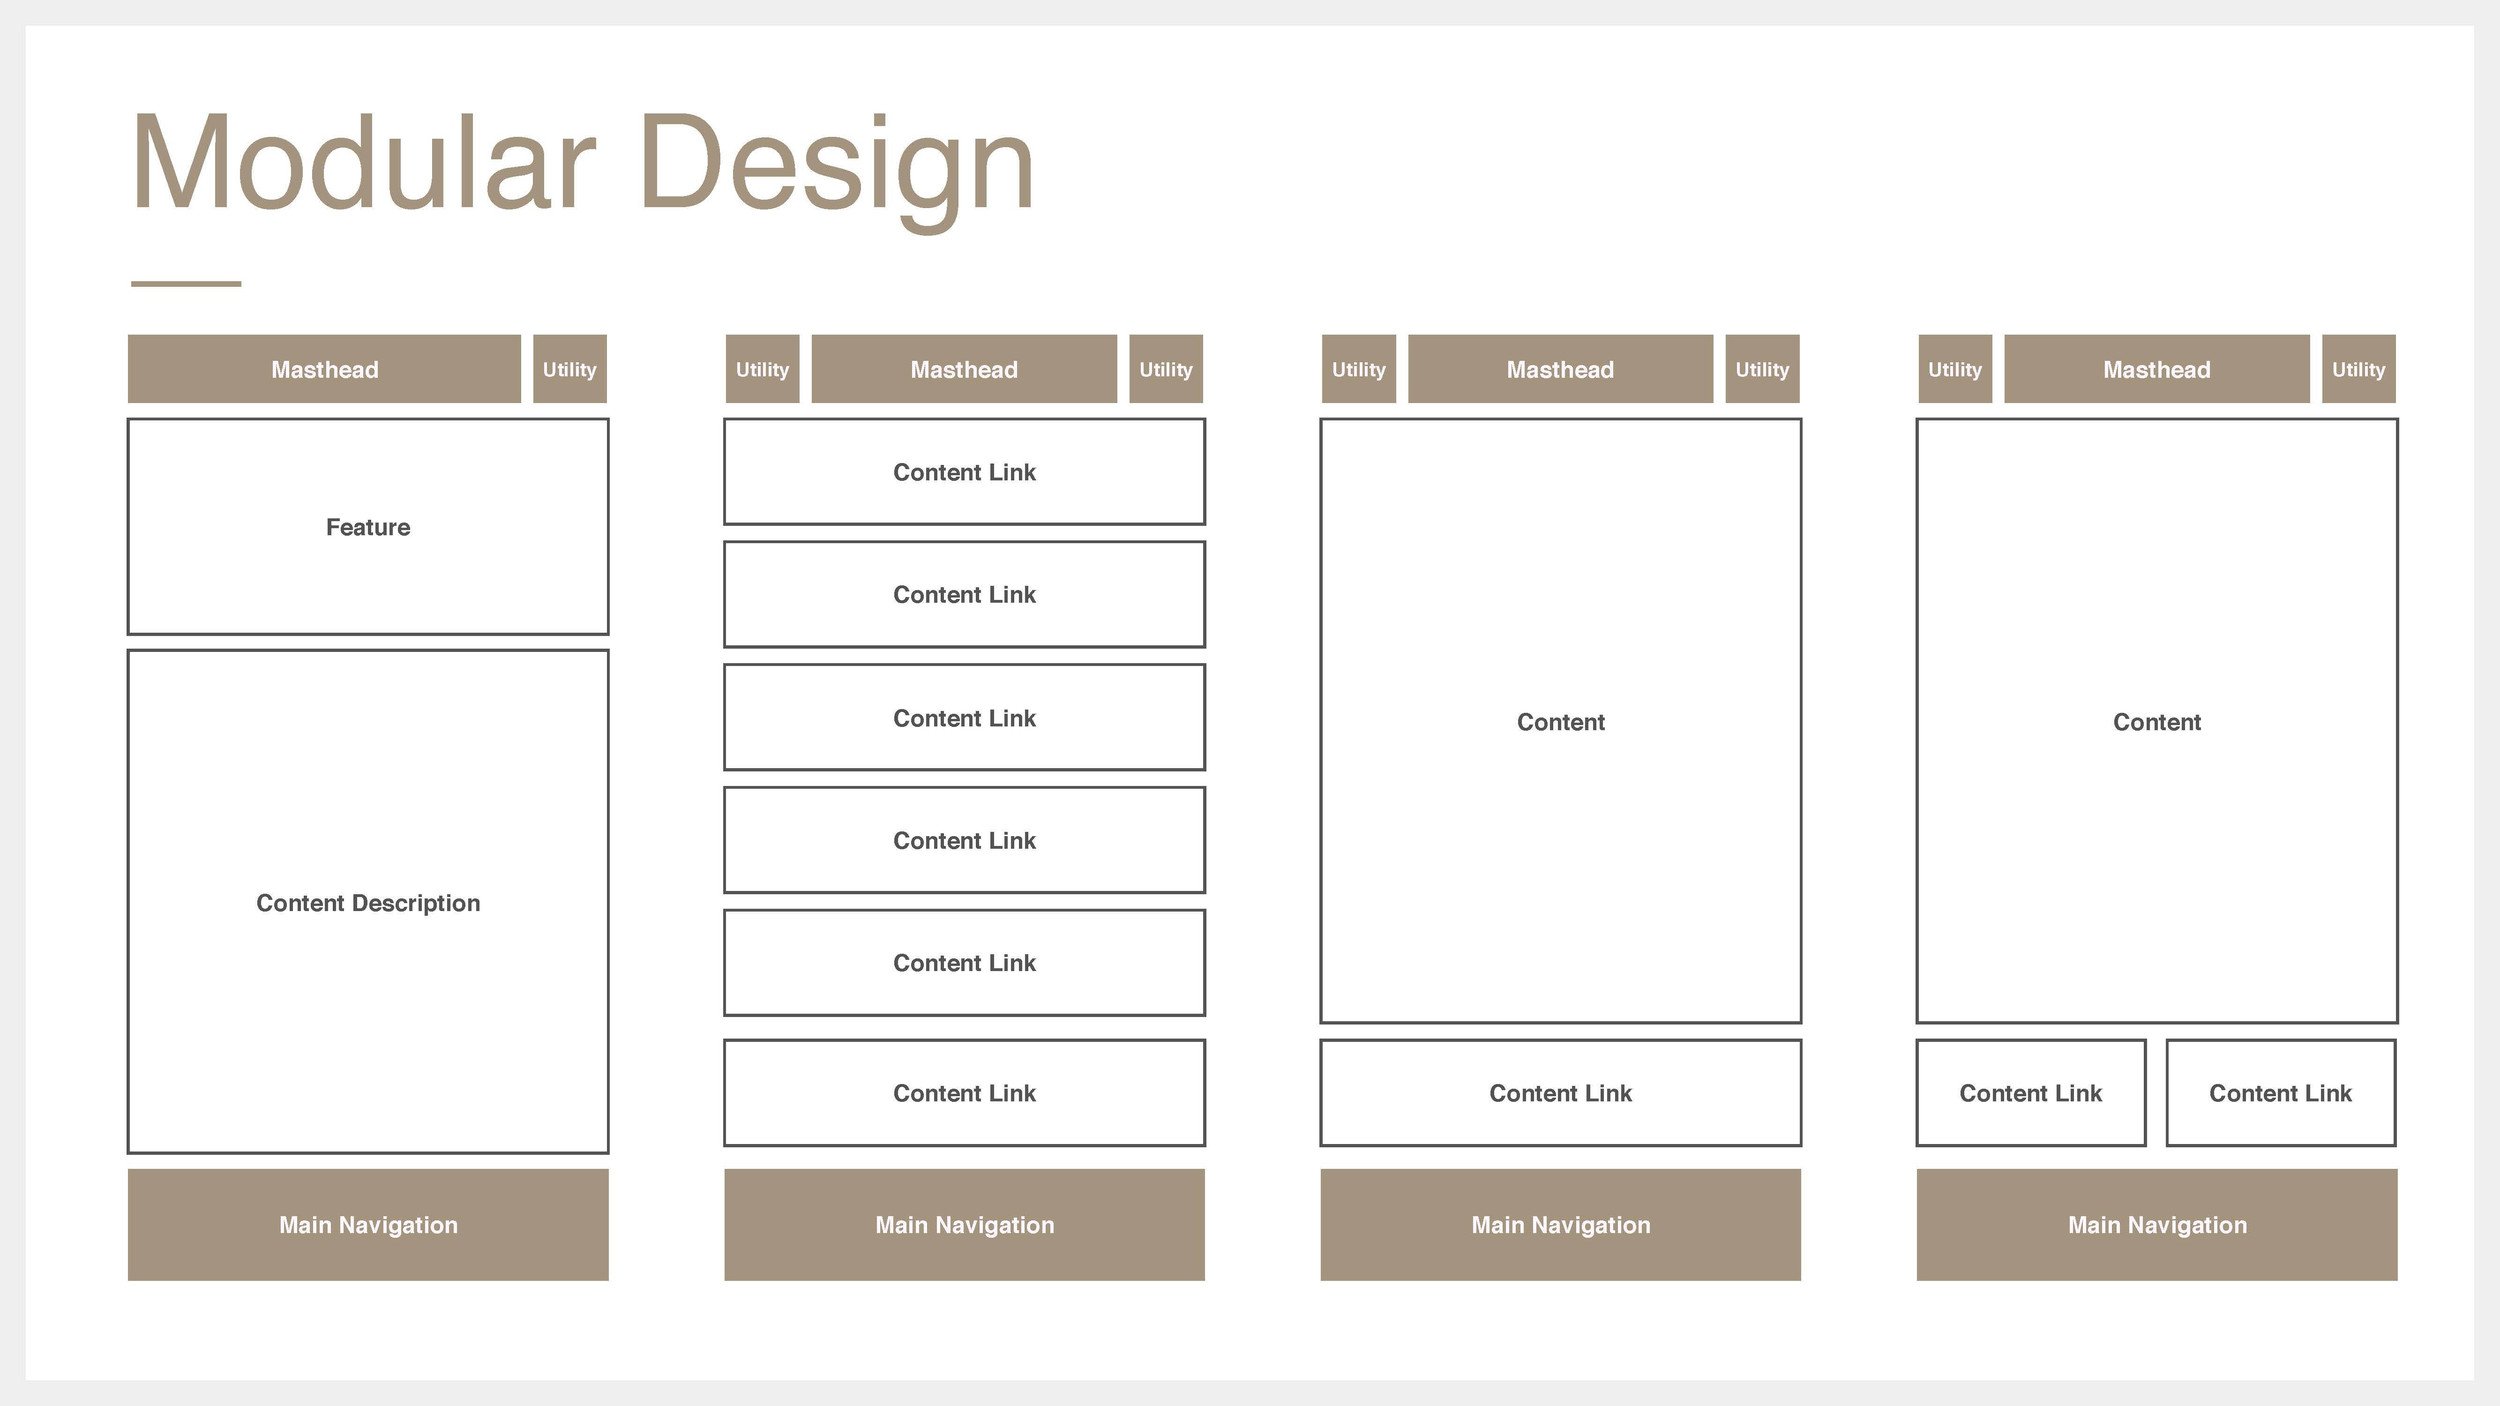 P3 Presentation Master-Final_Page_27.jpg